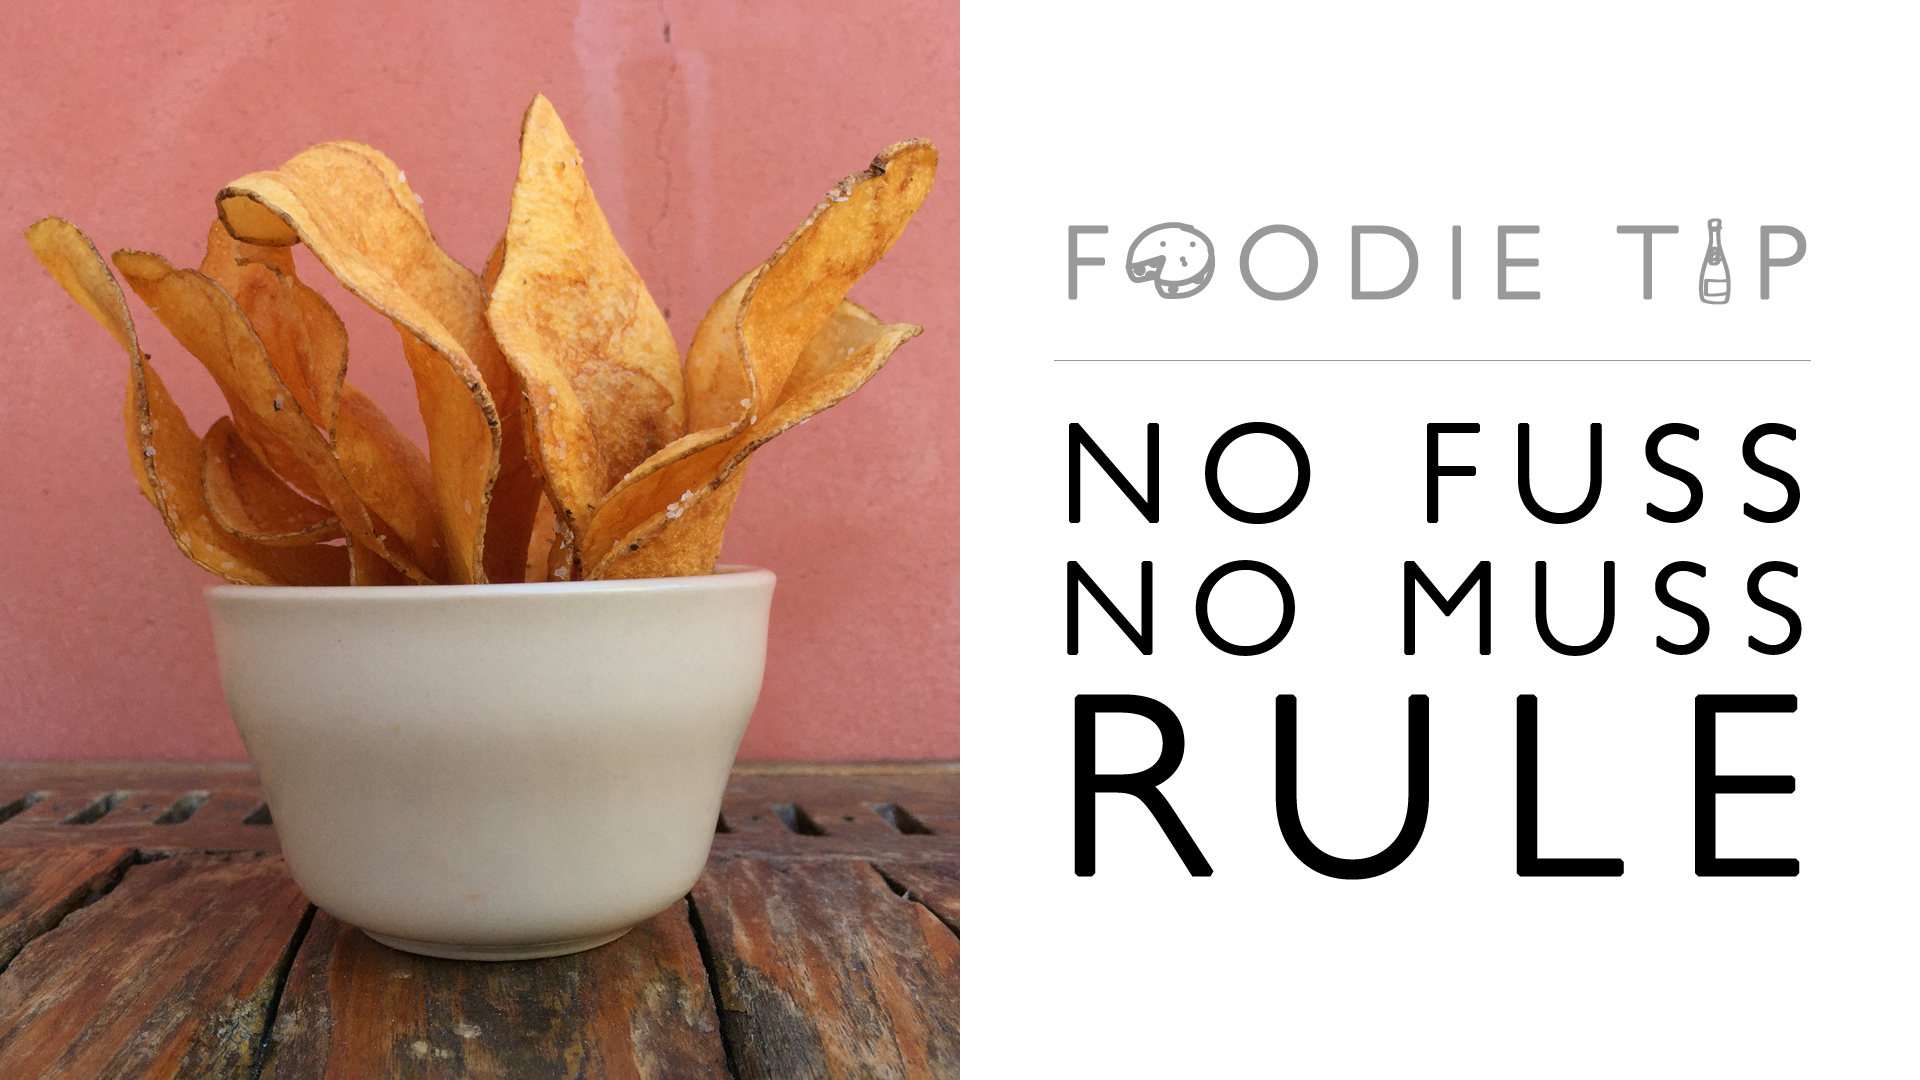 no fuss. no muss.